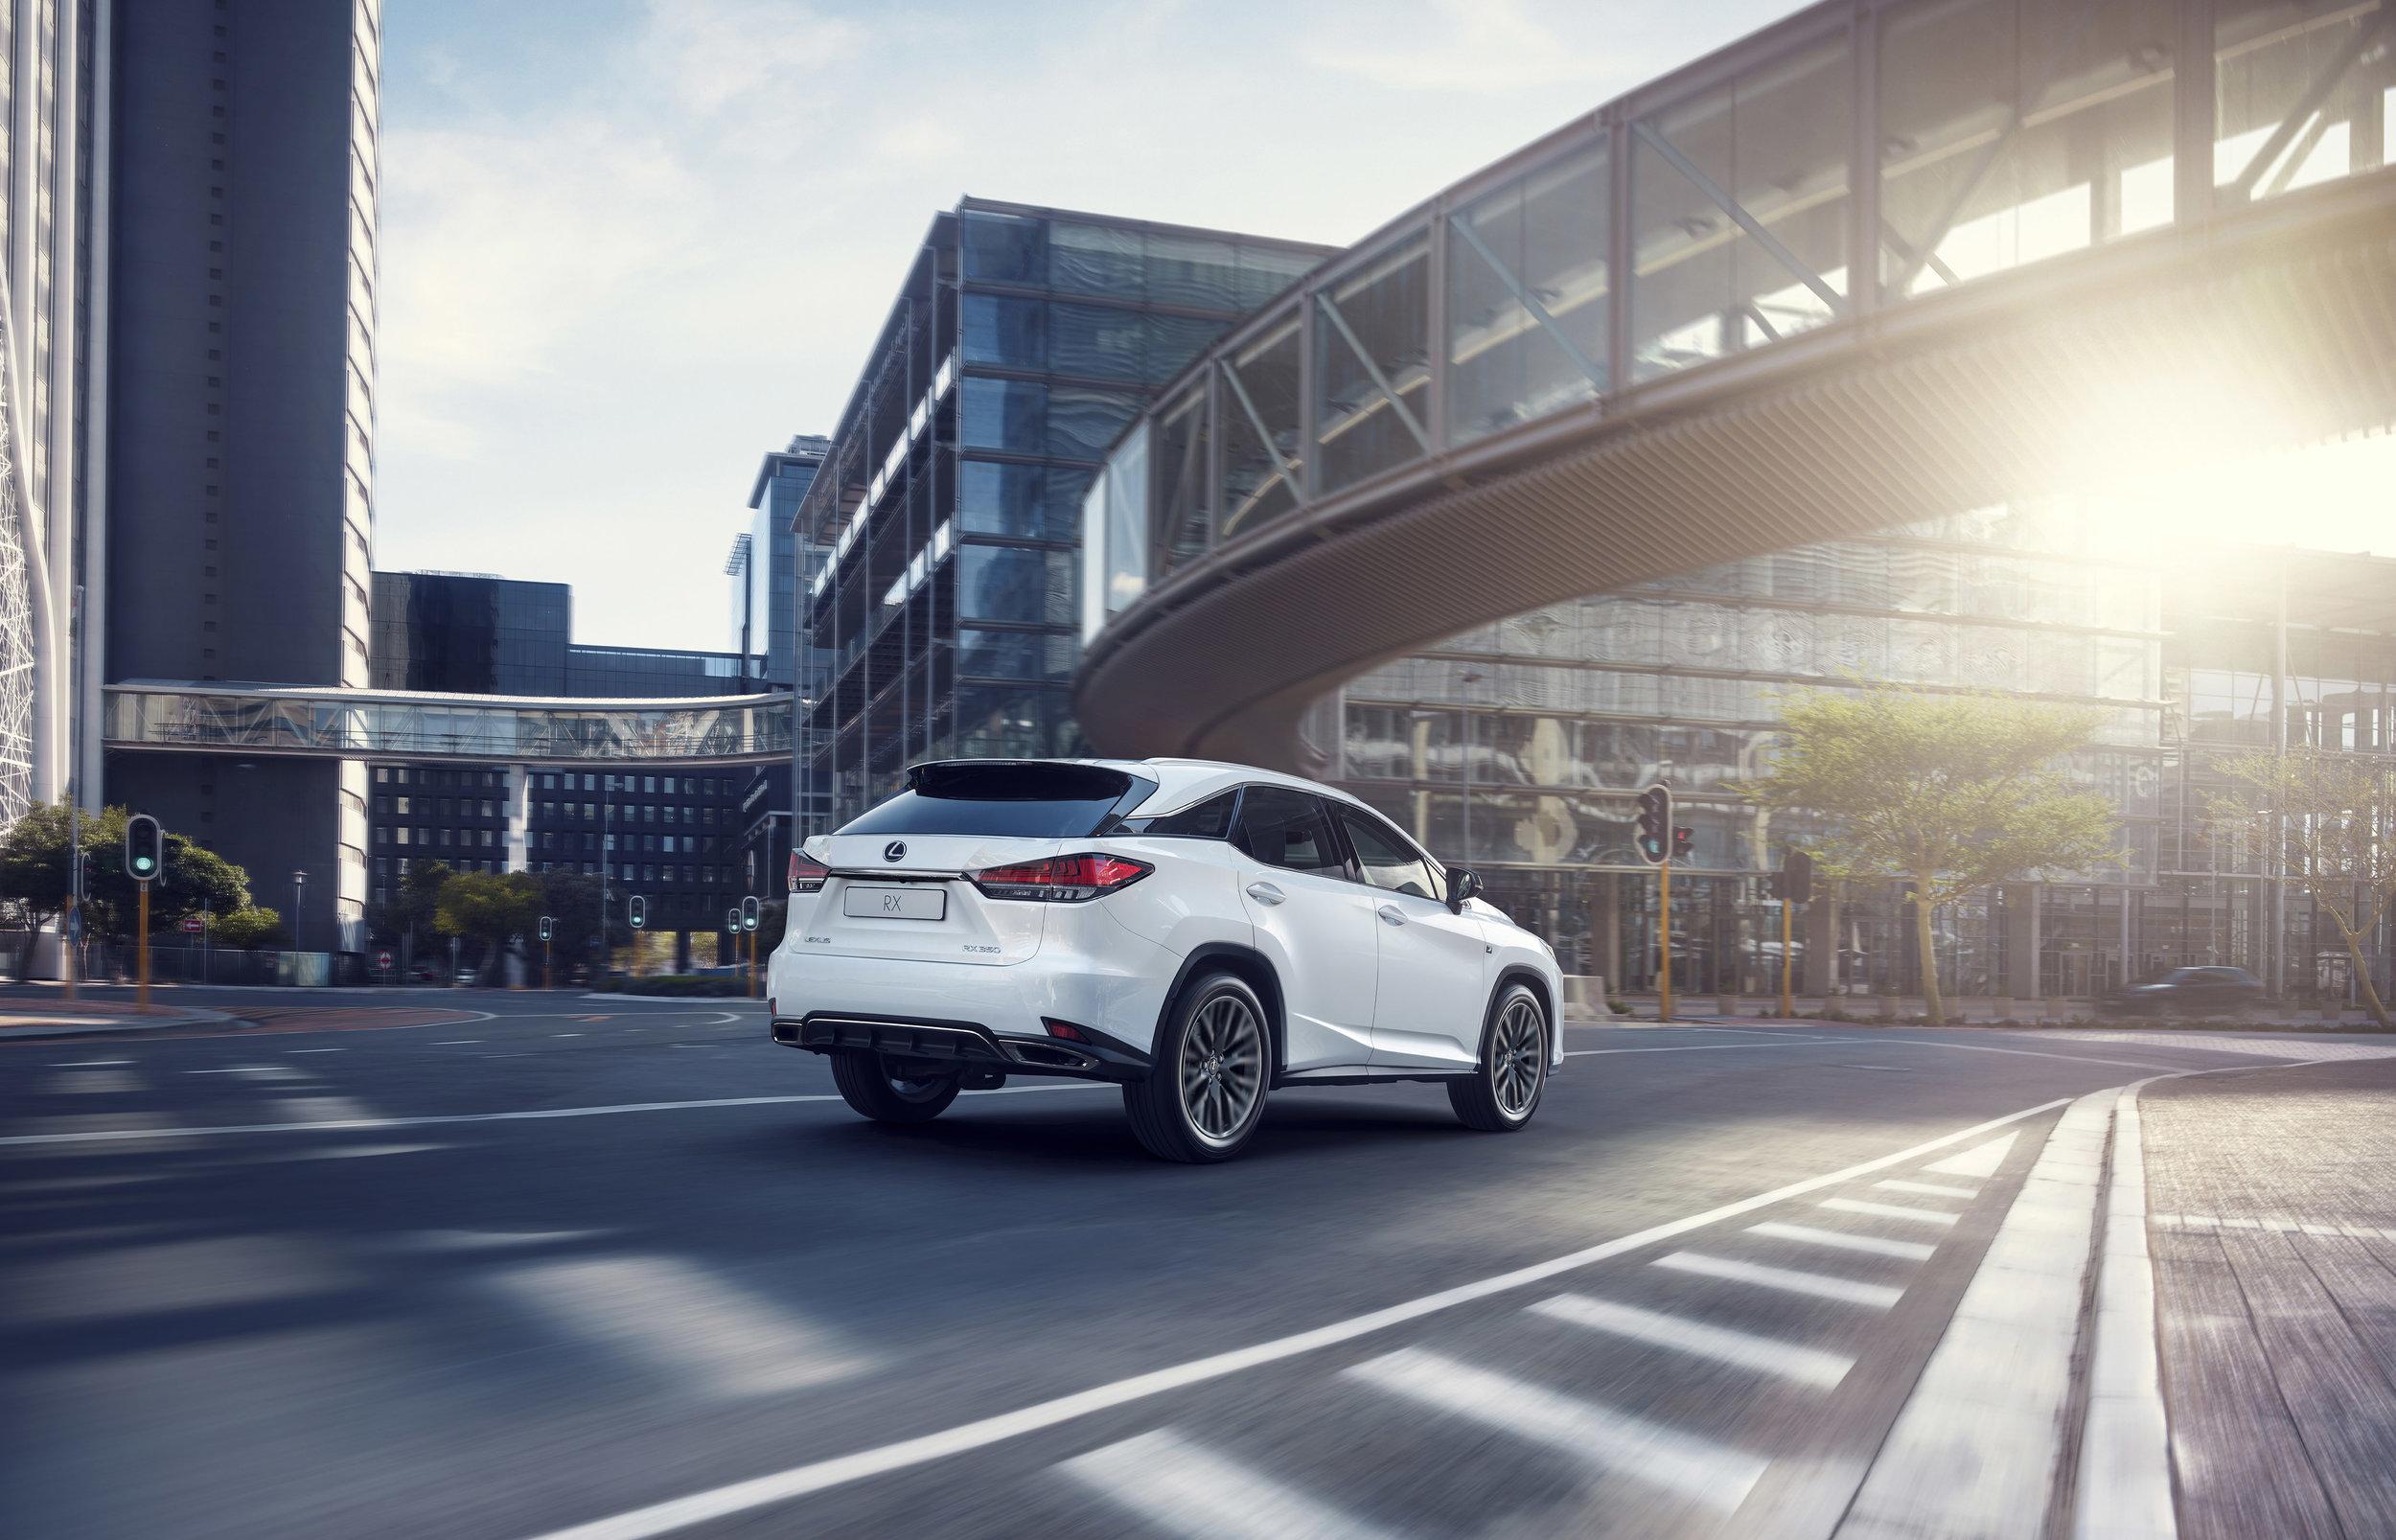 IMAGE_2019 Lexus RX international image shown (002).jpg